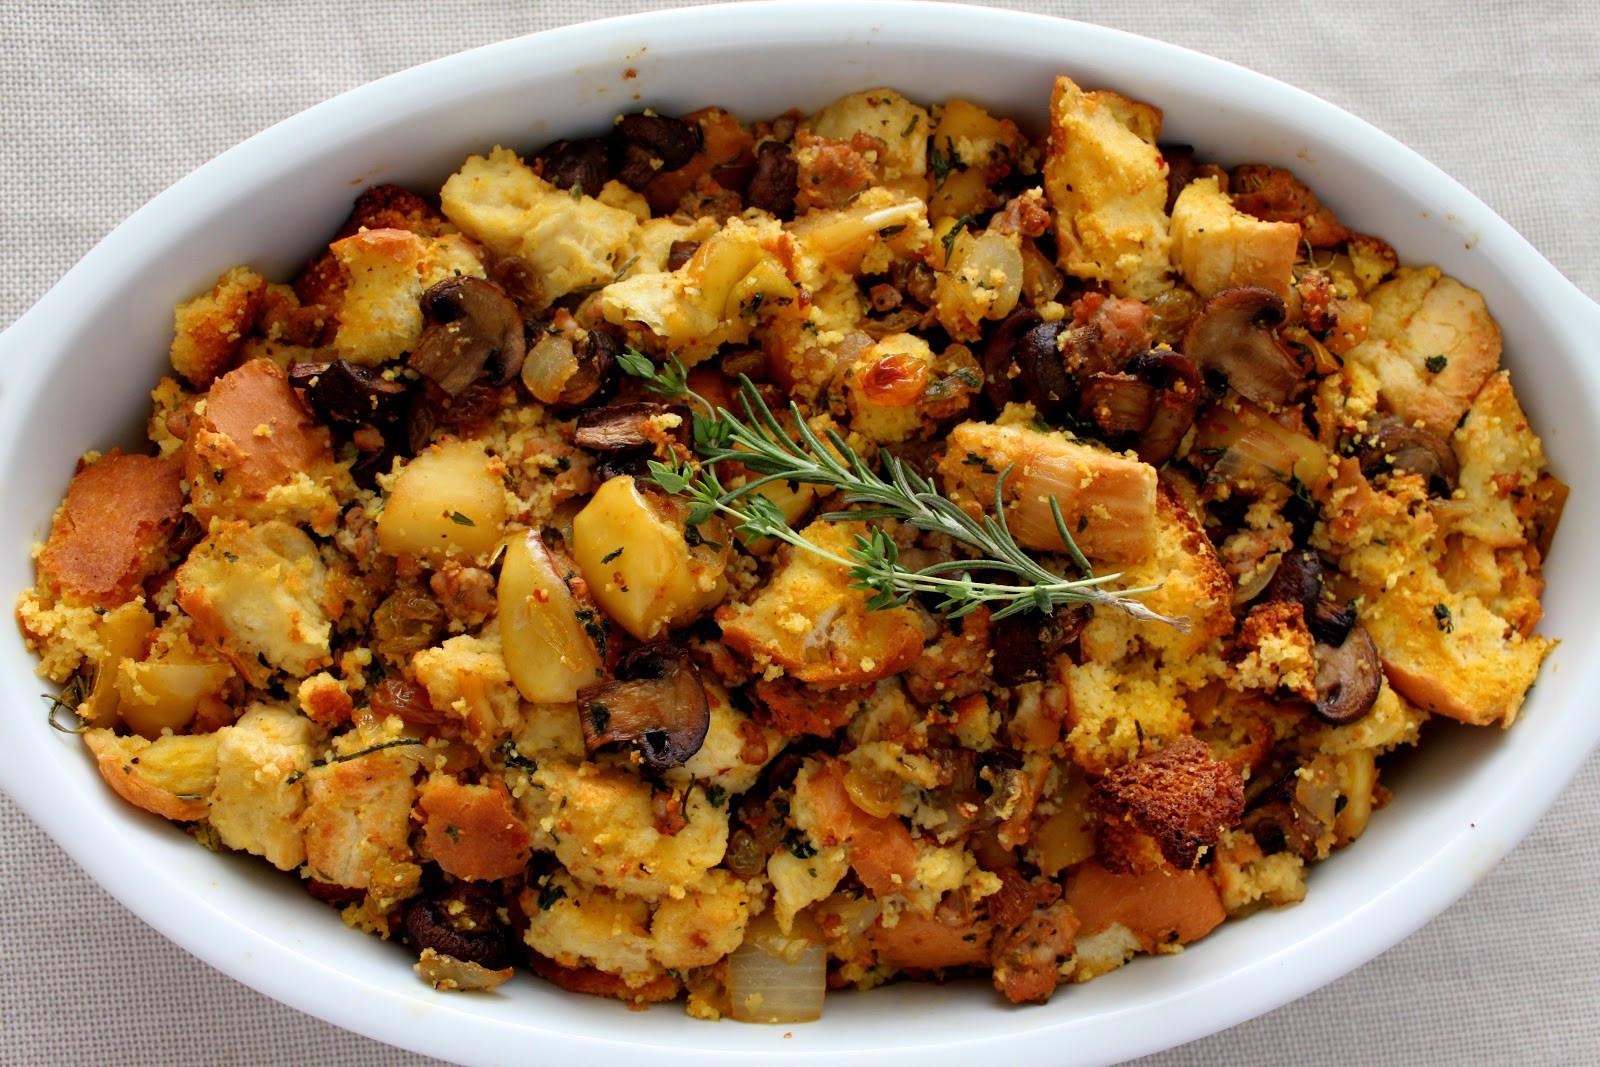 Italian Thanksgiving Recipes  A Bountiful Kitchen Artisan Cornbread Stuffing with